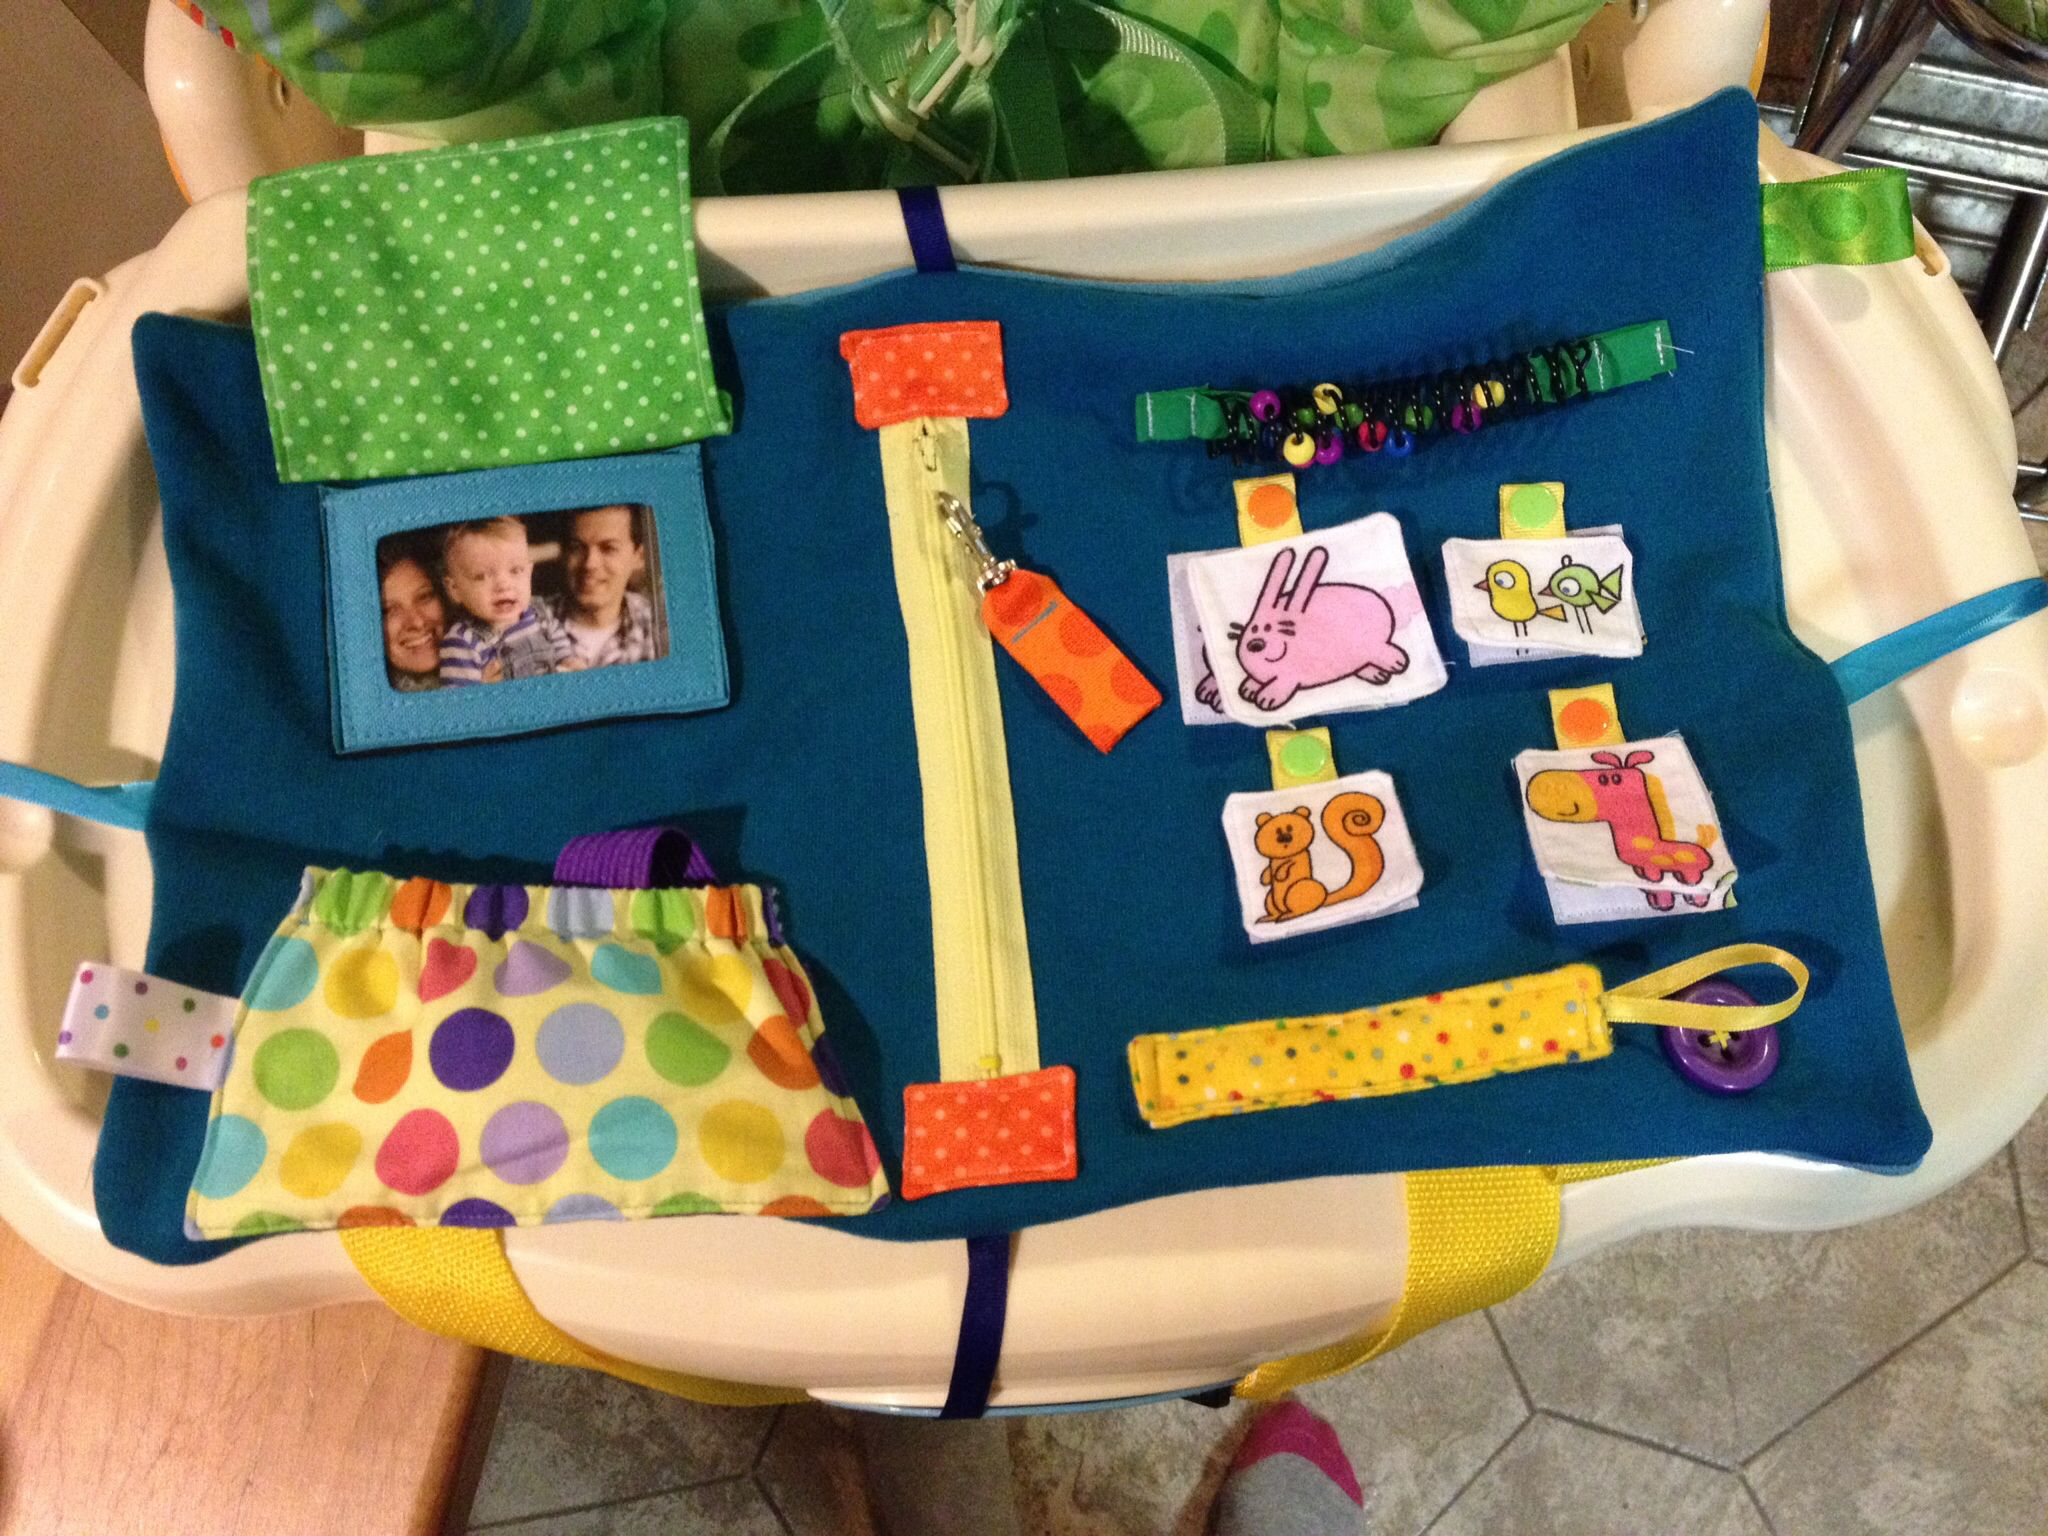 cushion playing activity play productdetail children b picnic baby kids mat crawling